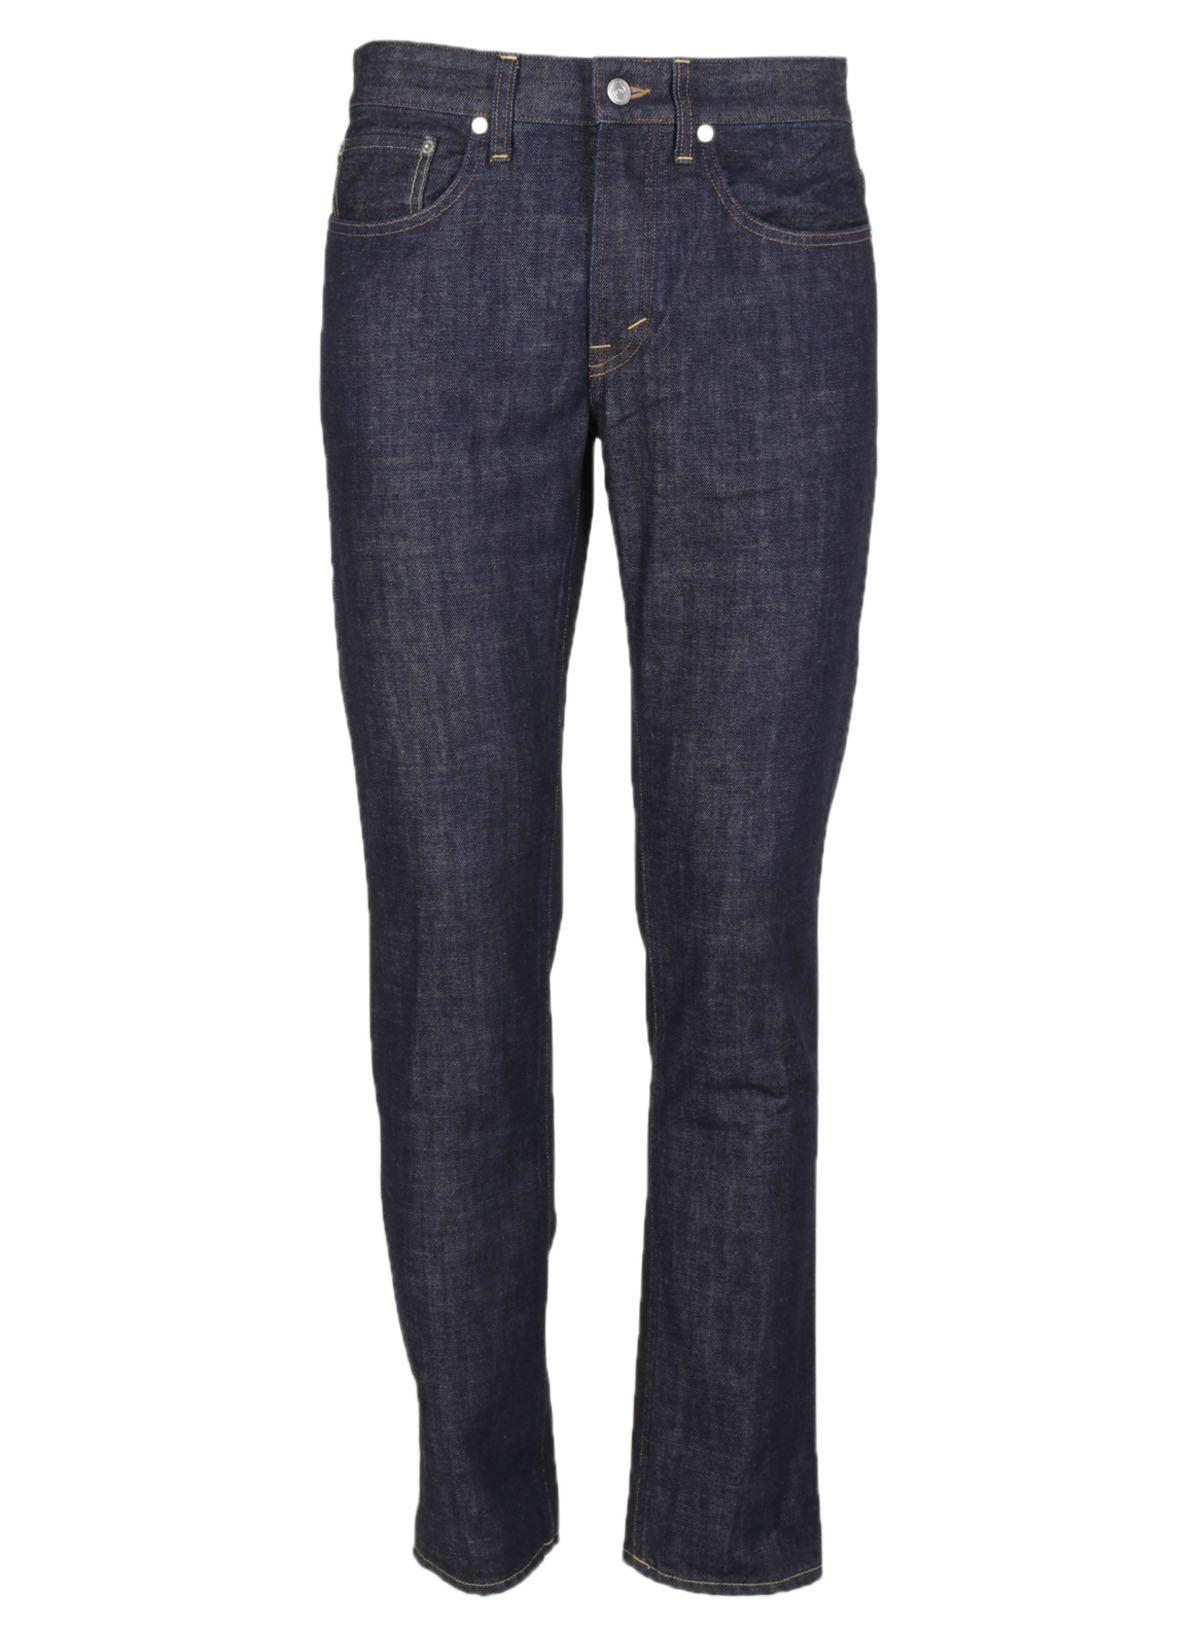 Department 5 Classic Jeans